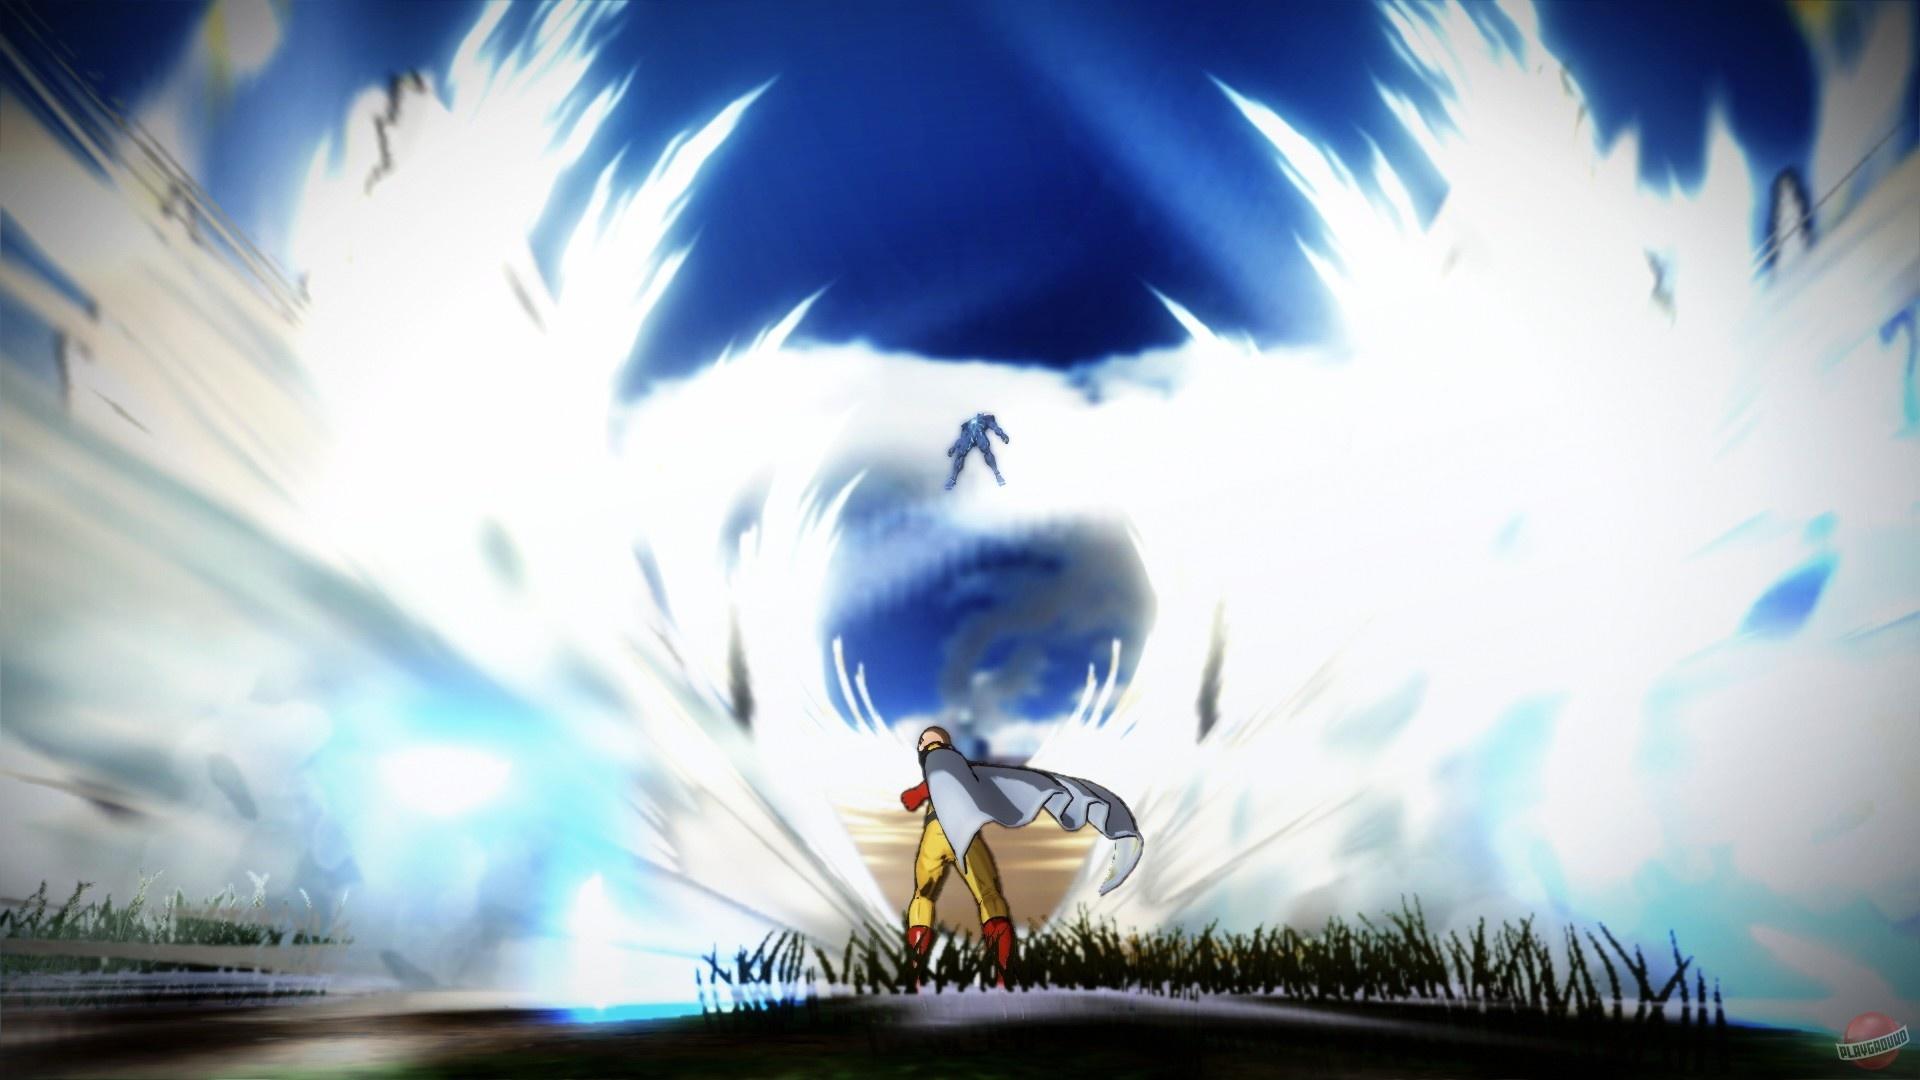 Релизный трейлер One Punch Man: A Hero Nobody Knows посвящён Сайтаме